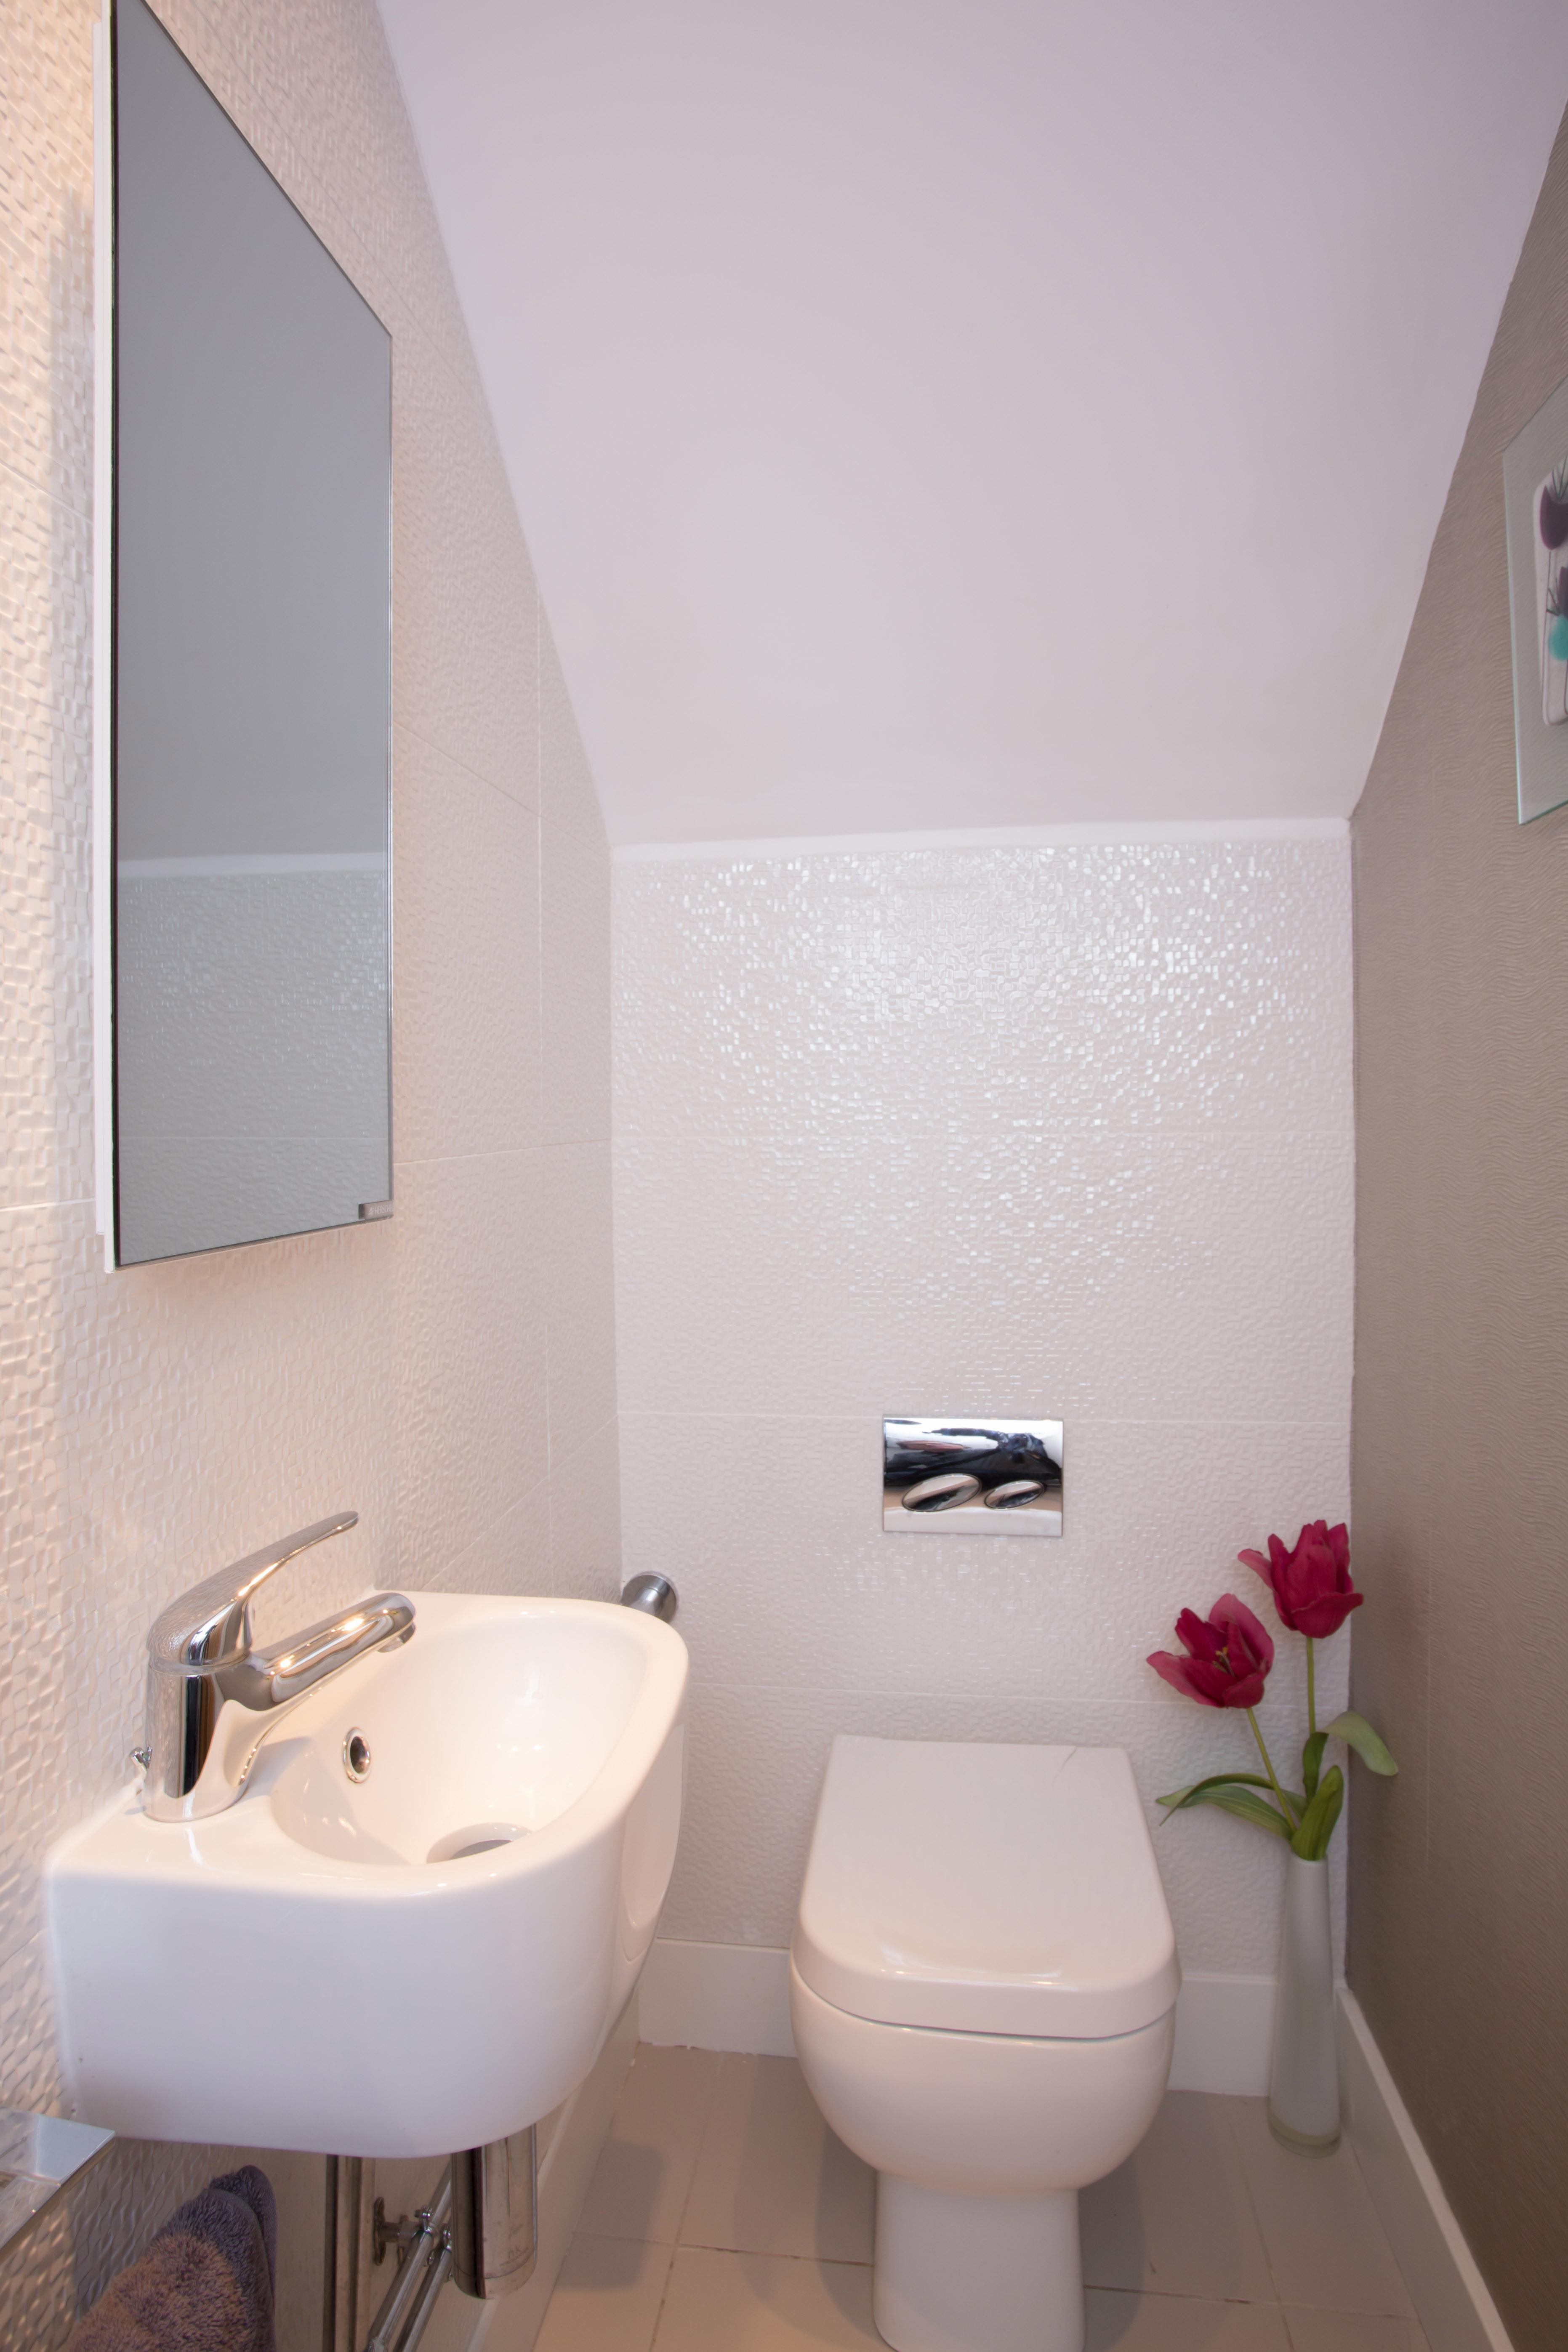 Select Xl Mirror Infrared Heater Brisbane Fireplace